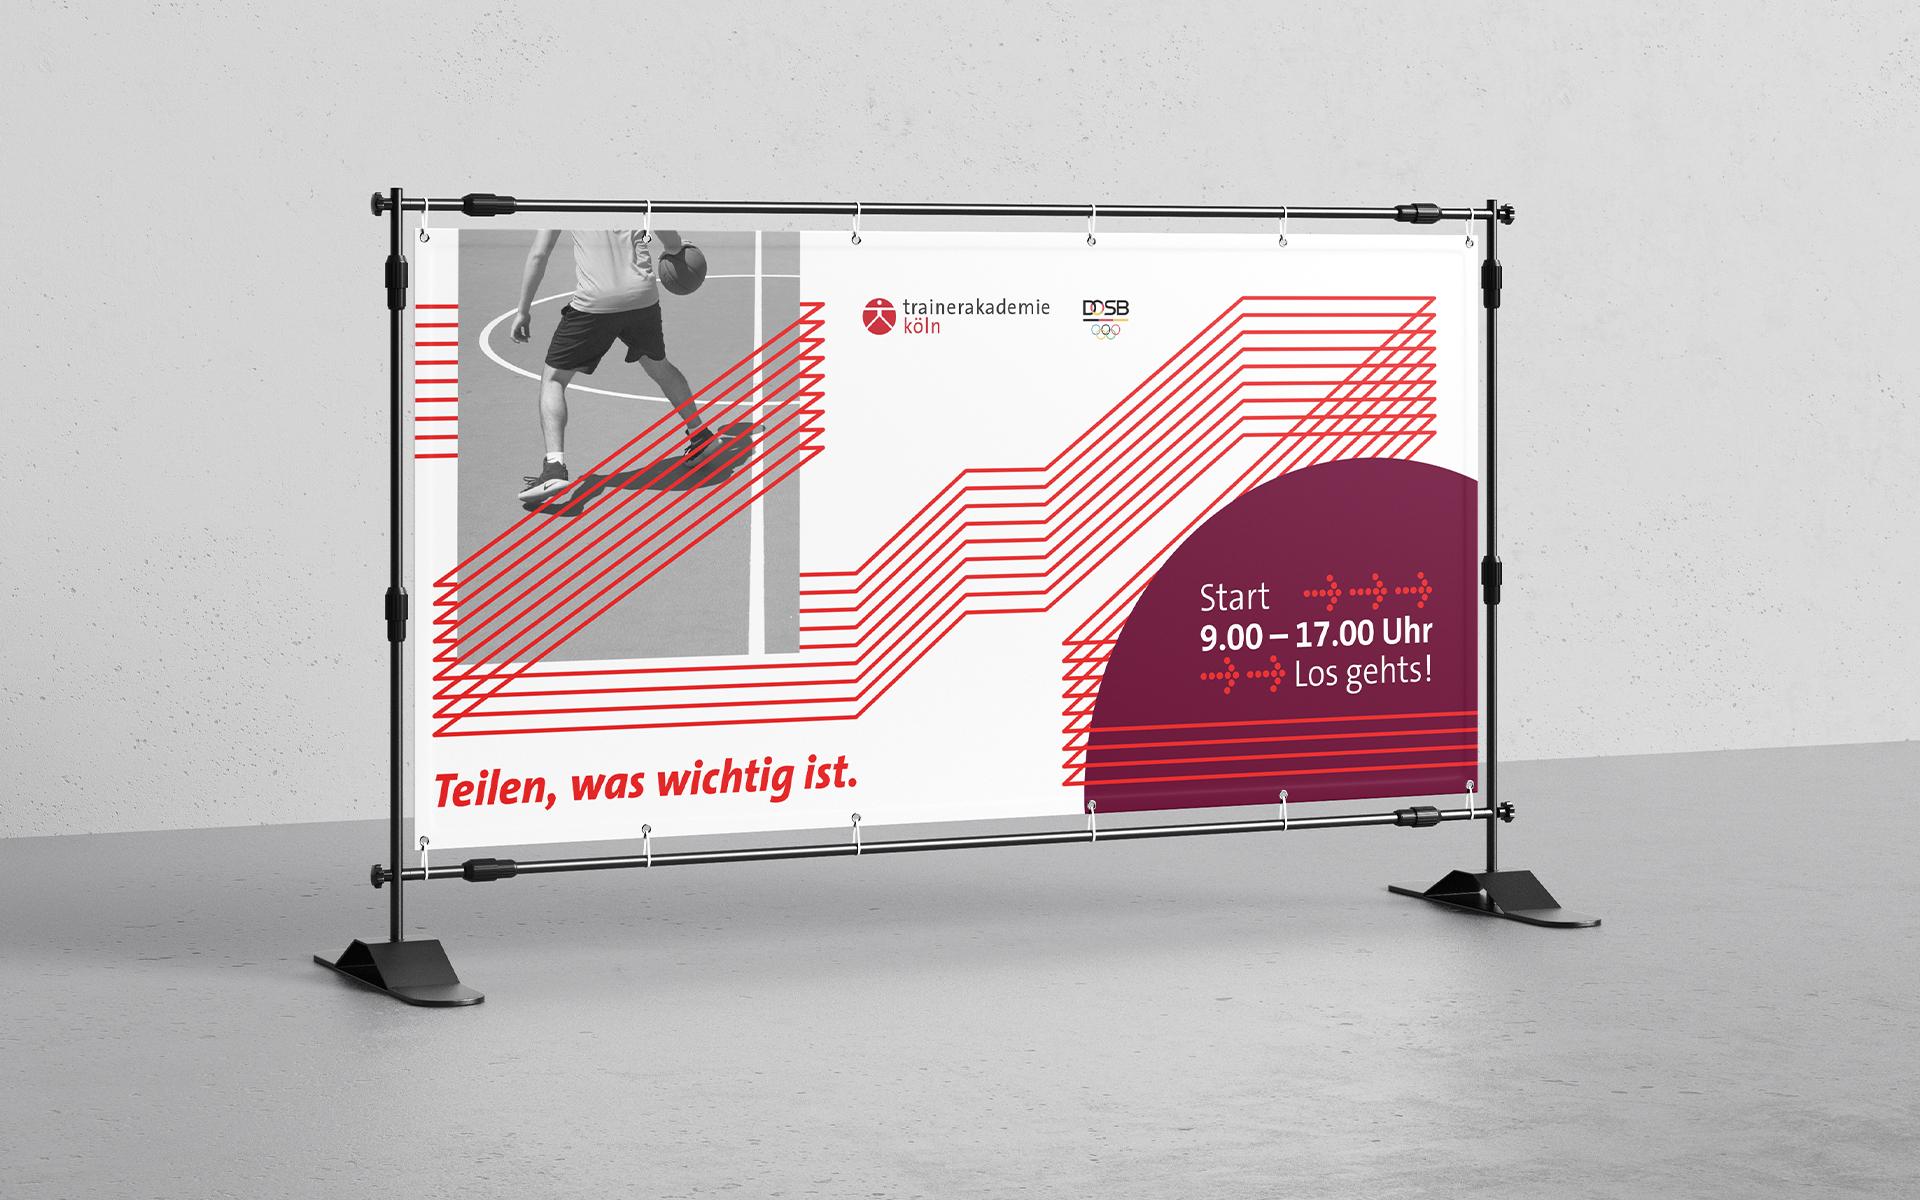 Trainerakademie Köln Corporate Design, Werbewand, Messewand